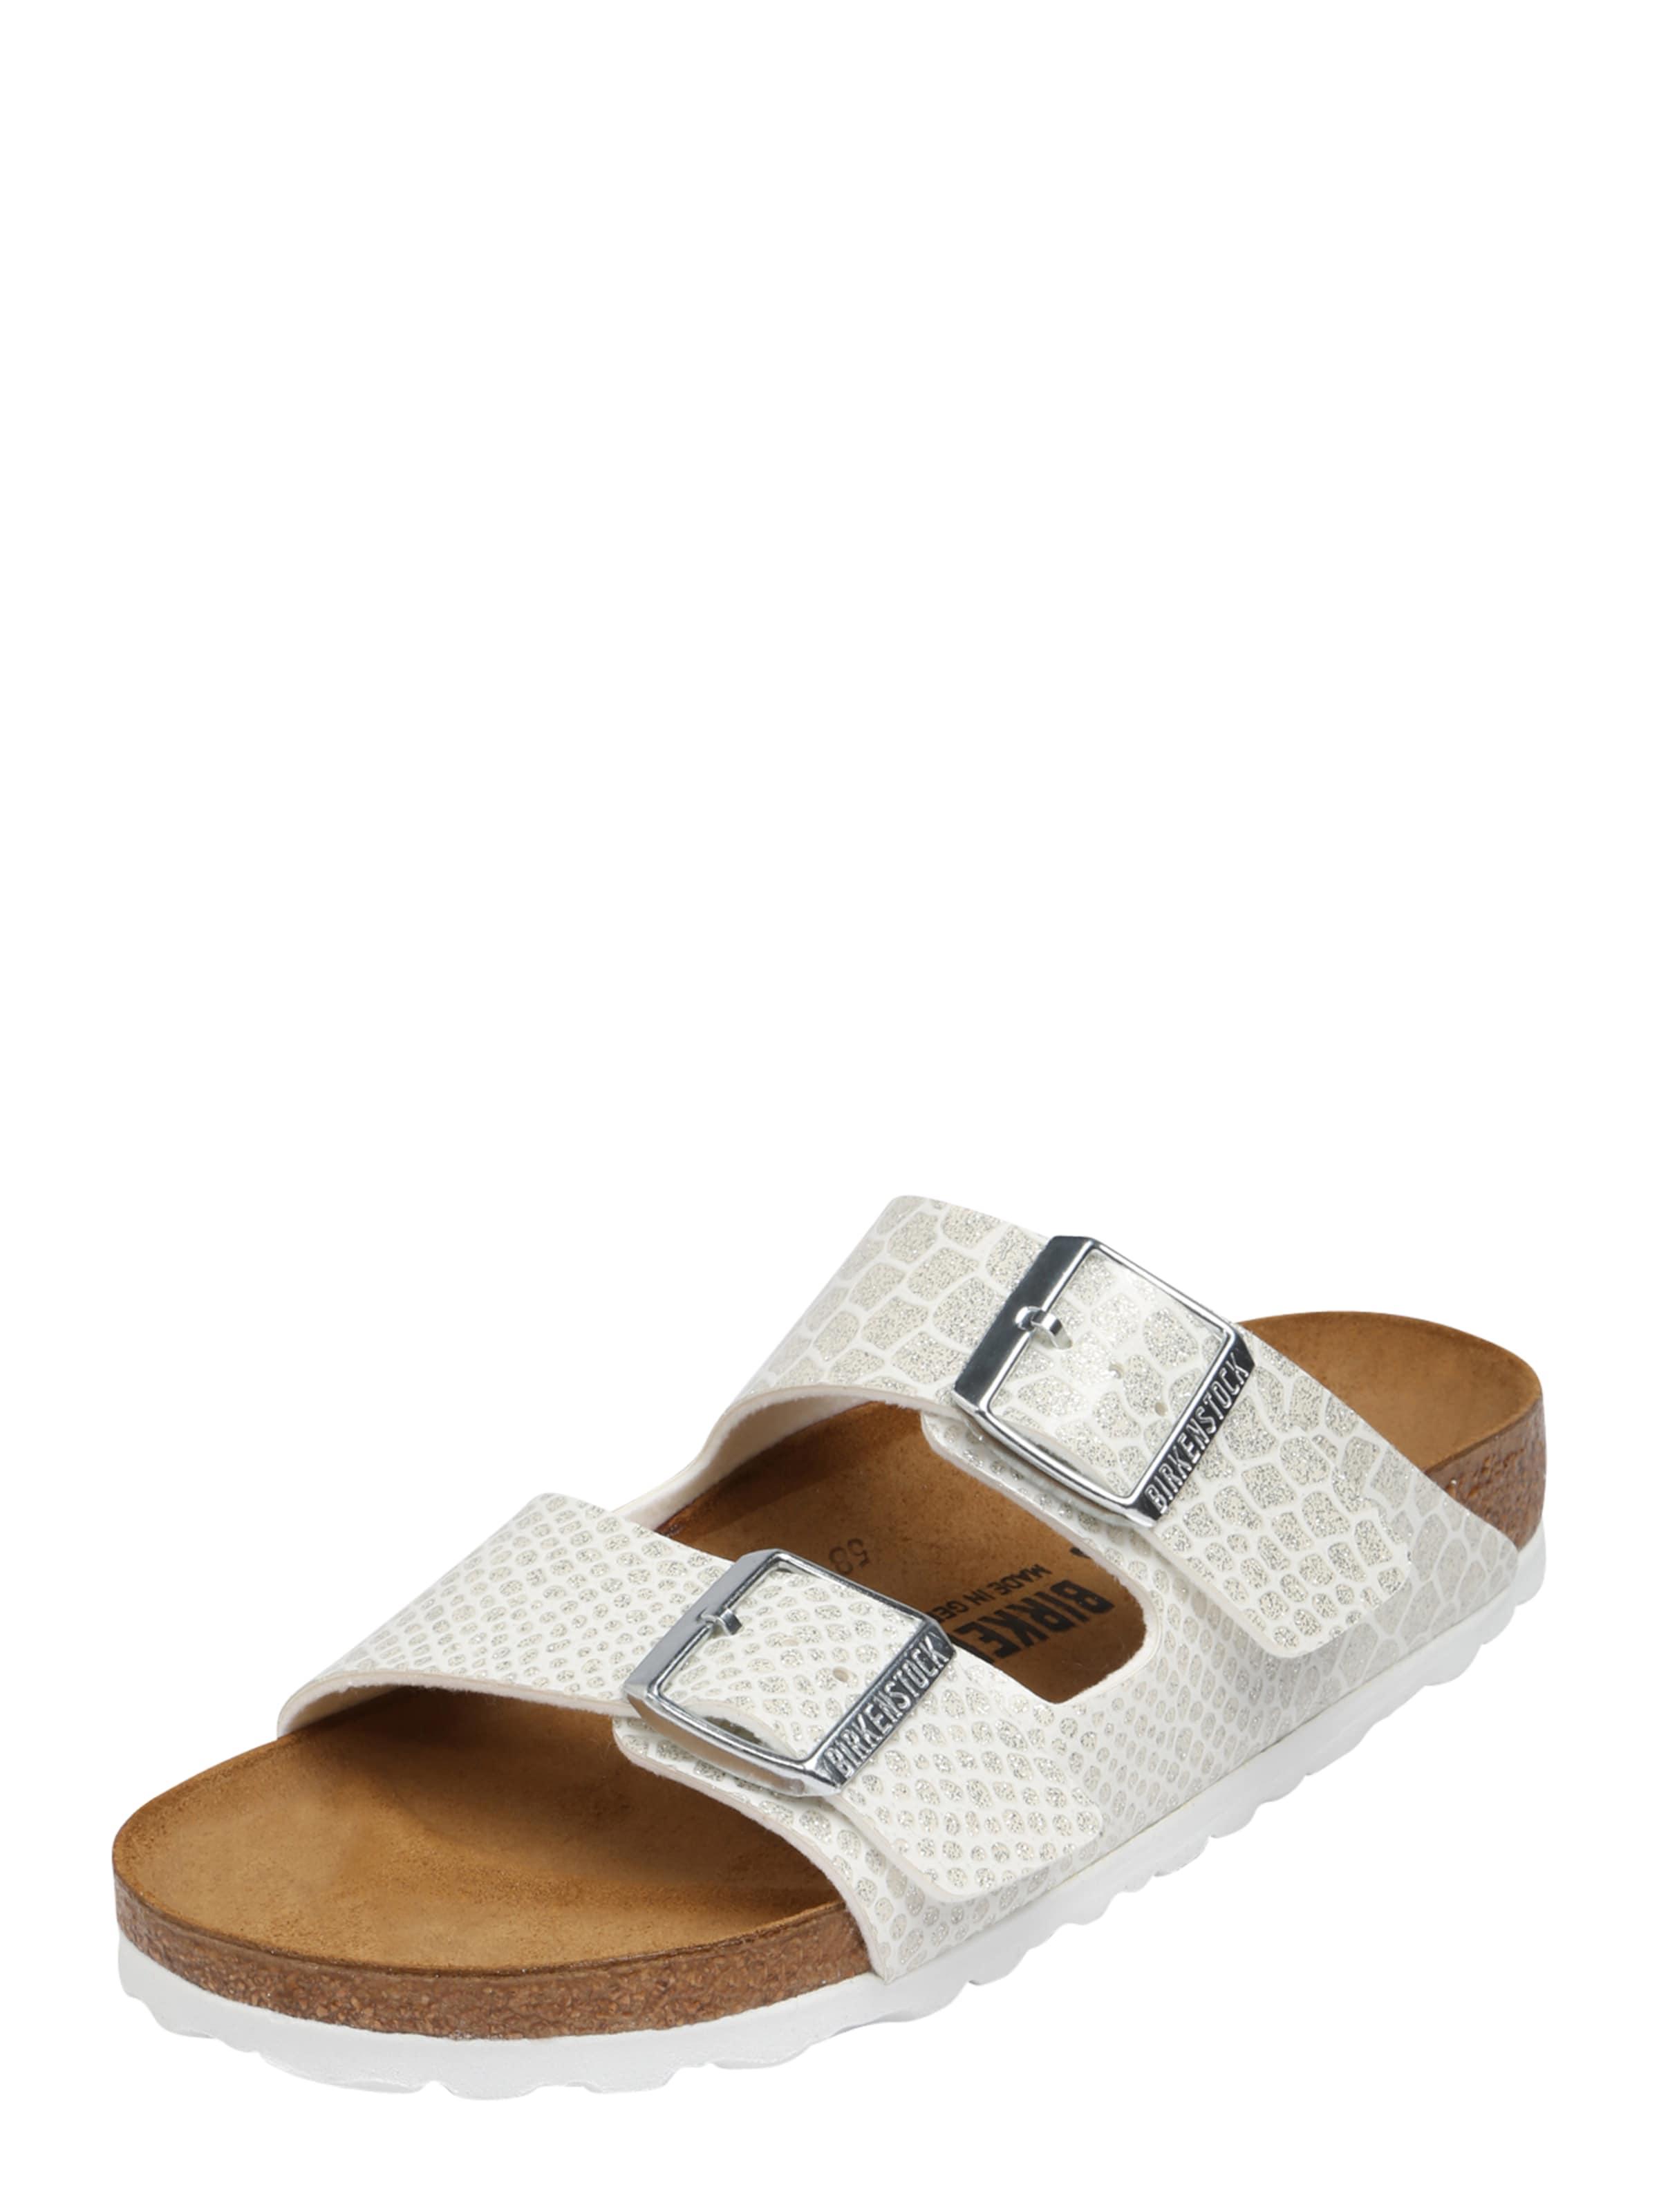 Sandale SilberWeiß In 'arizona' Birkenstock htsdrQ